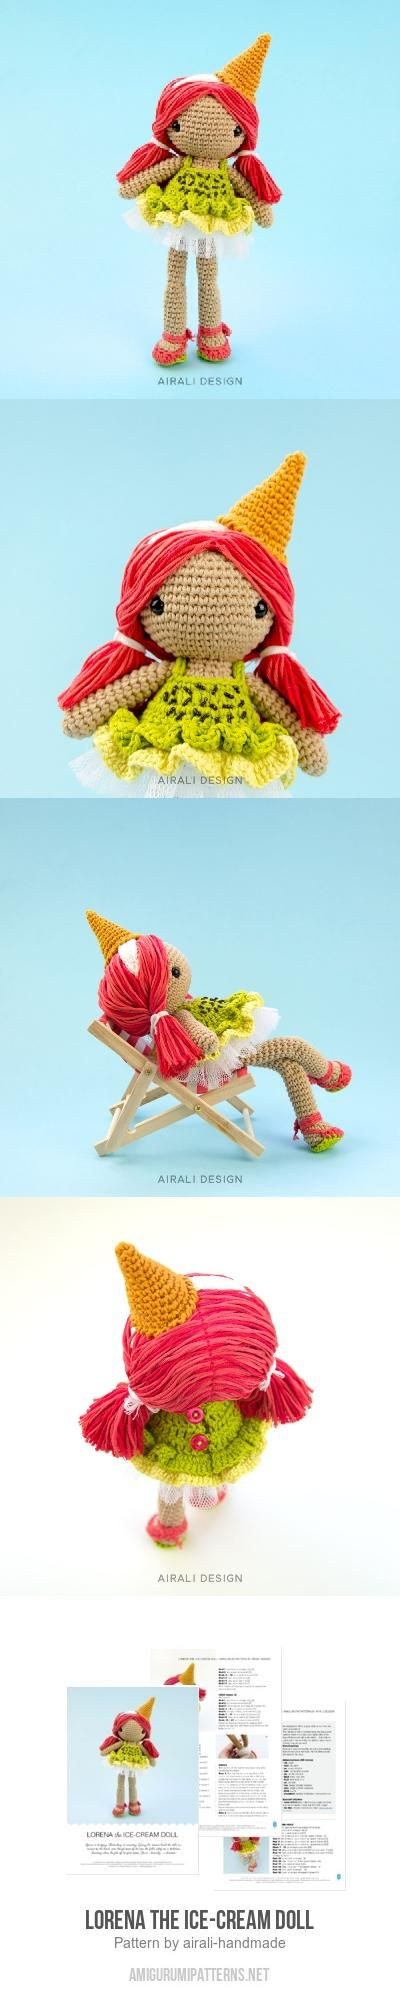 Lorena The Ice-cream Doll Amigurumi Pattern